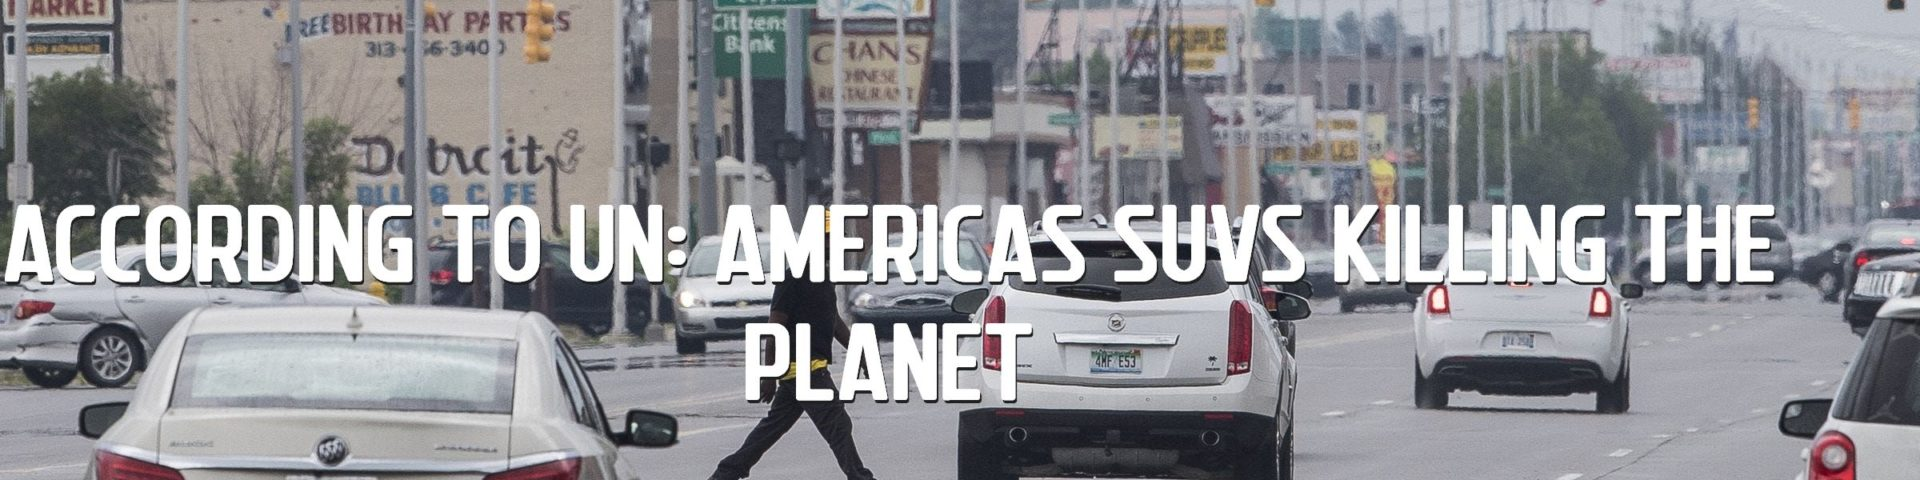 According To UN: Americas Suvs Killing The Planet